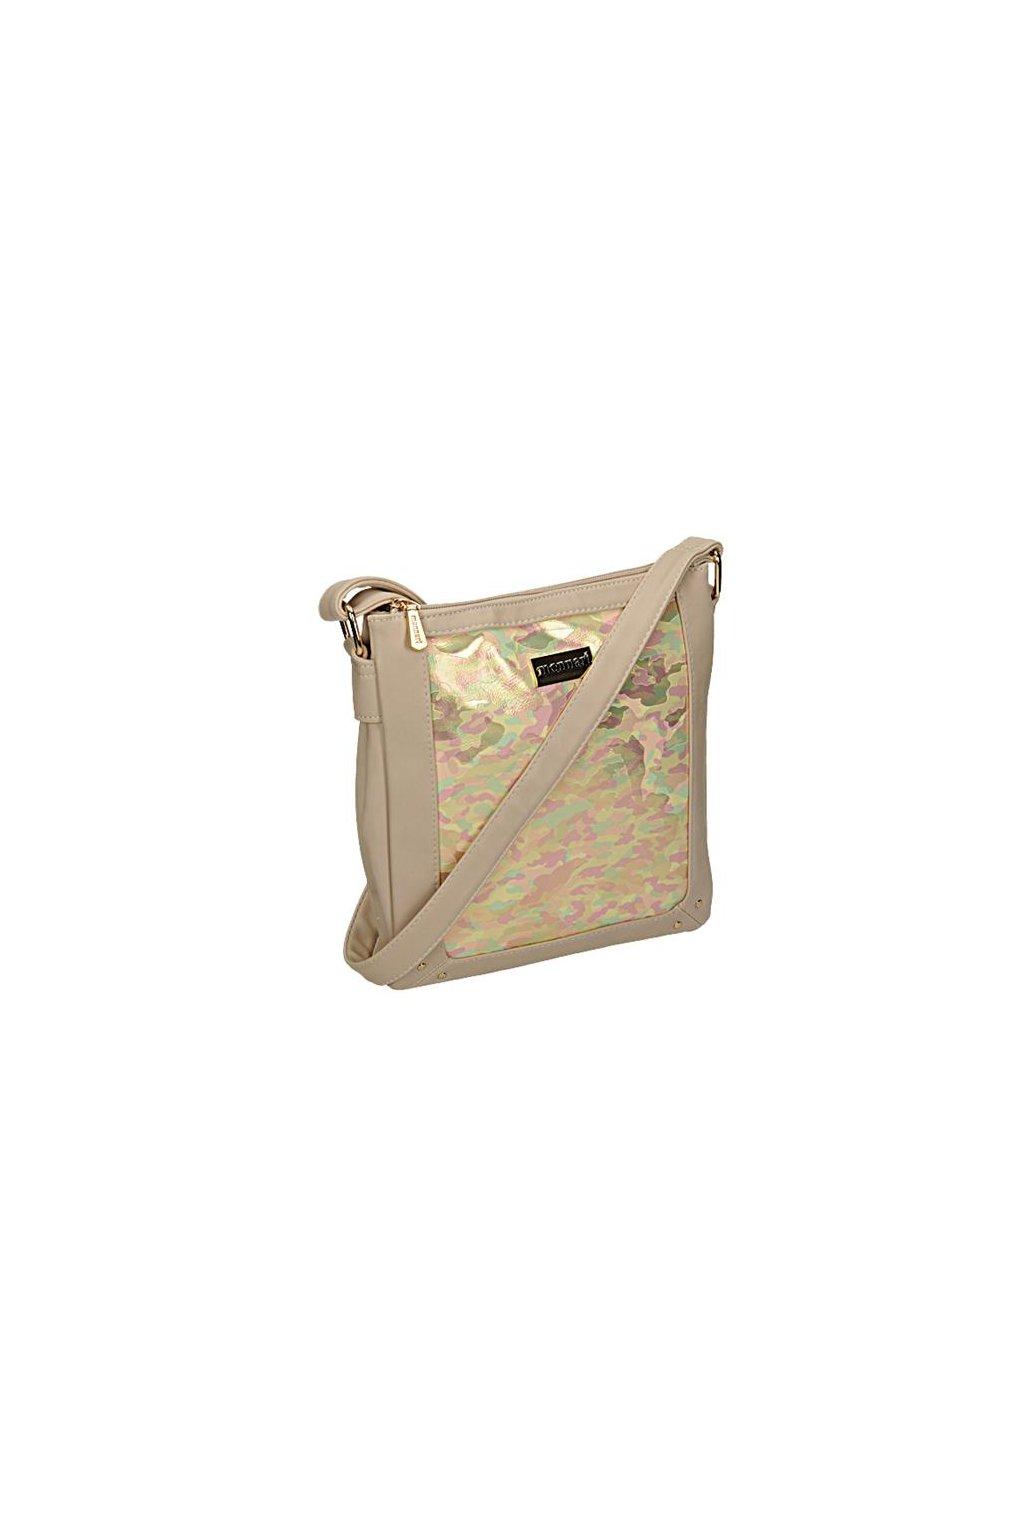 Béžová crossbody kabelka MONNARI BAG 1690-015 W18